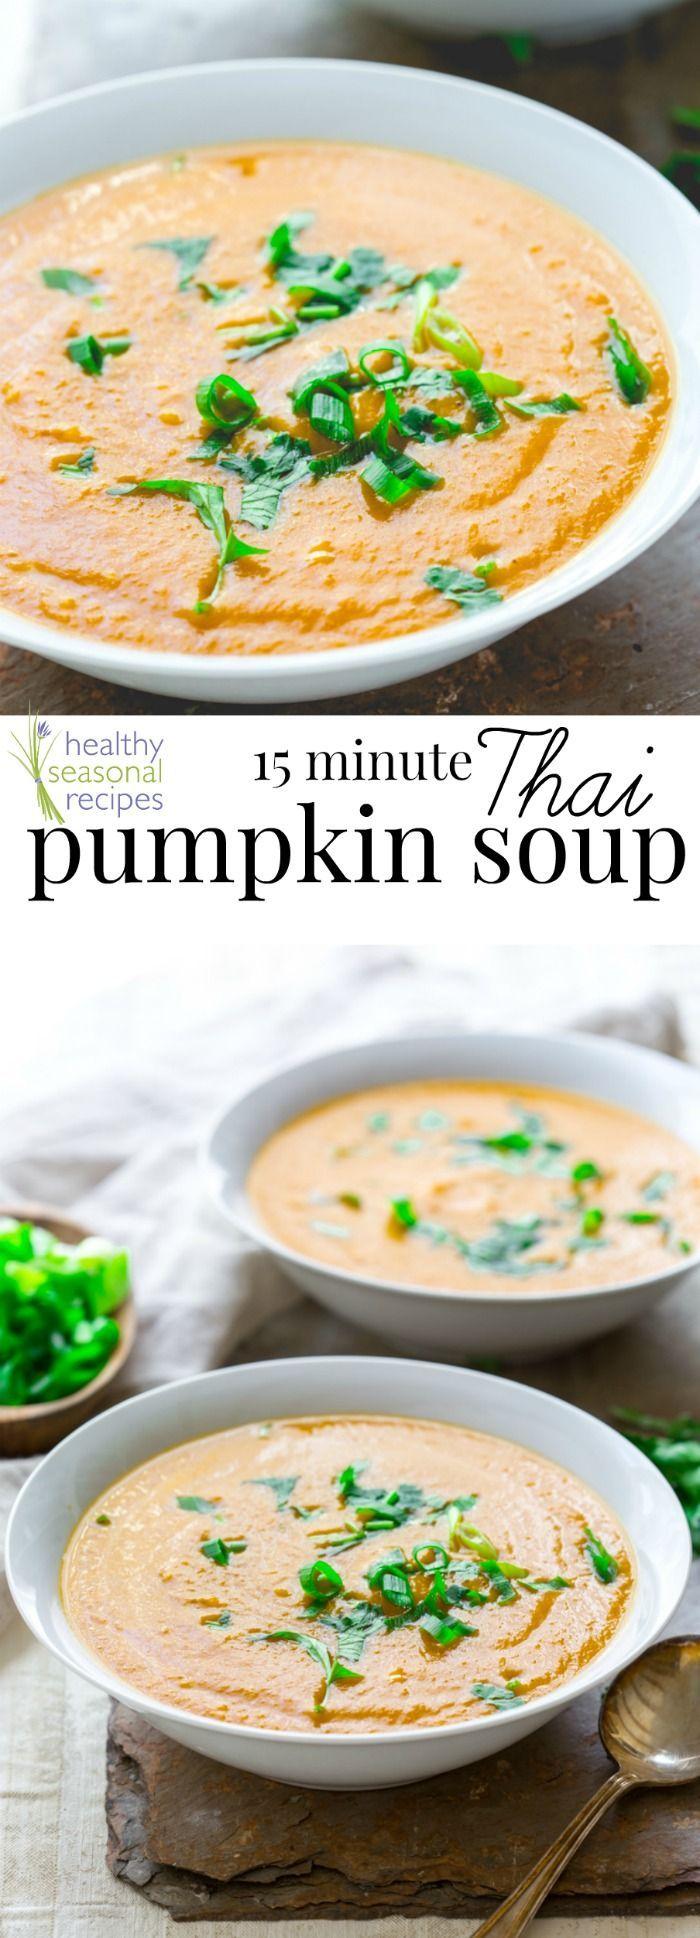 15 minute thai pumpkin soup - Healthy Seasonal Recipes